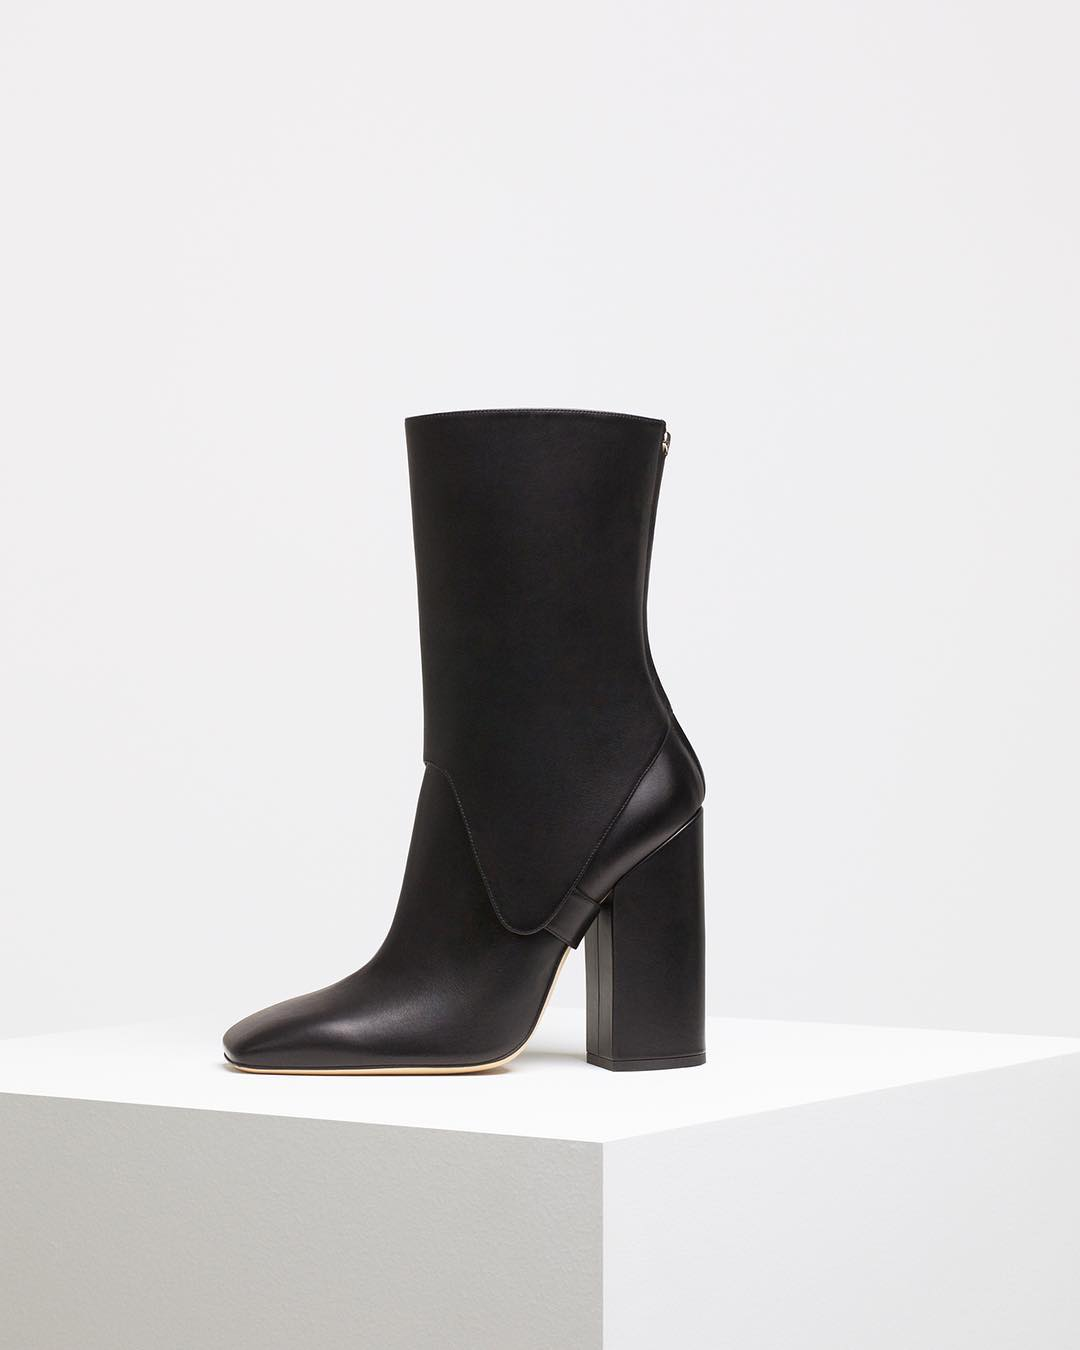 Victoria Beckham Square Toe Saddle Boots 2020